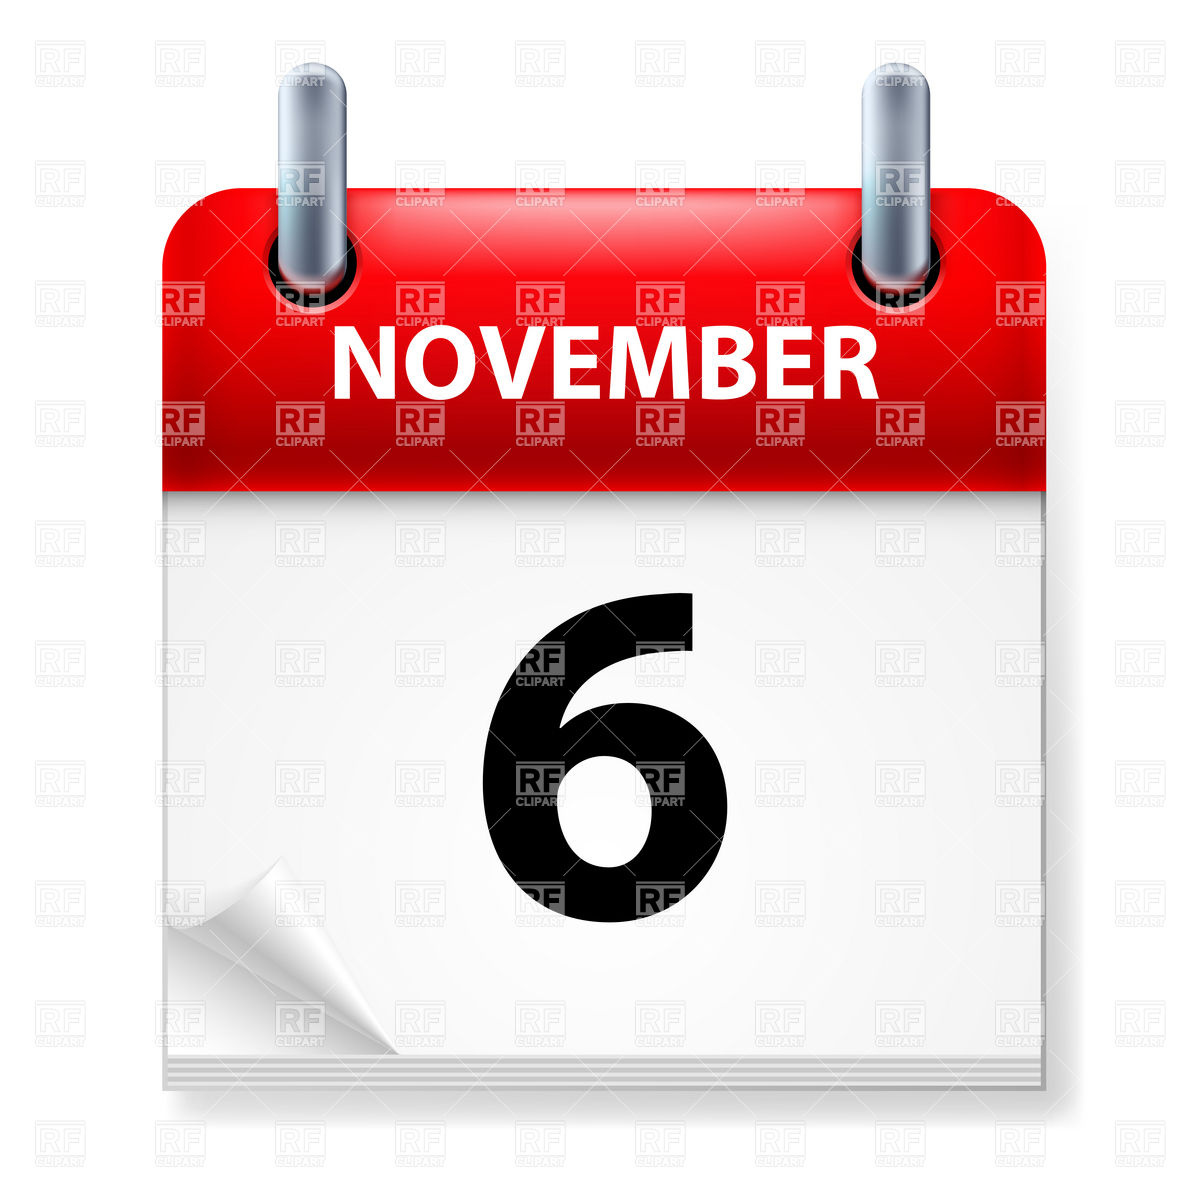 Calendar clipart december 24 svg transparent library This week january 24 calendar clipart - ClipartFest svg transparent library